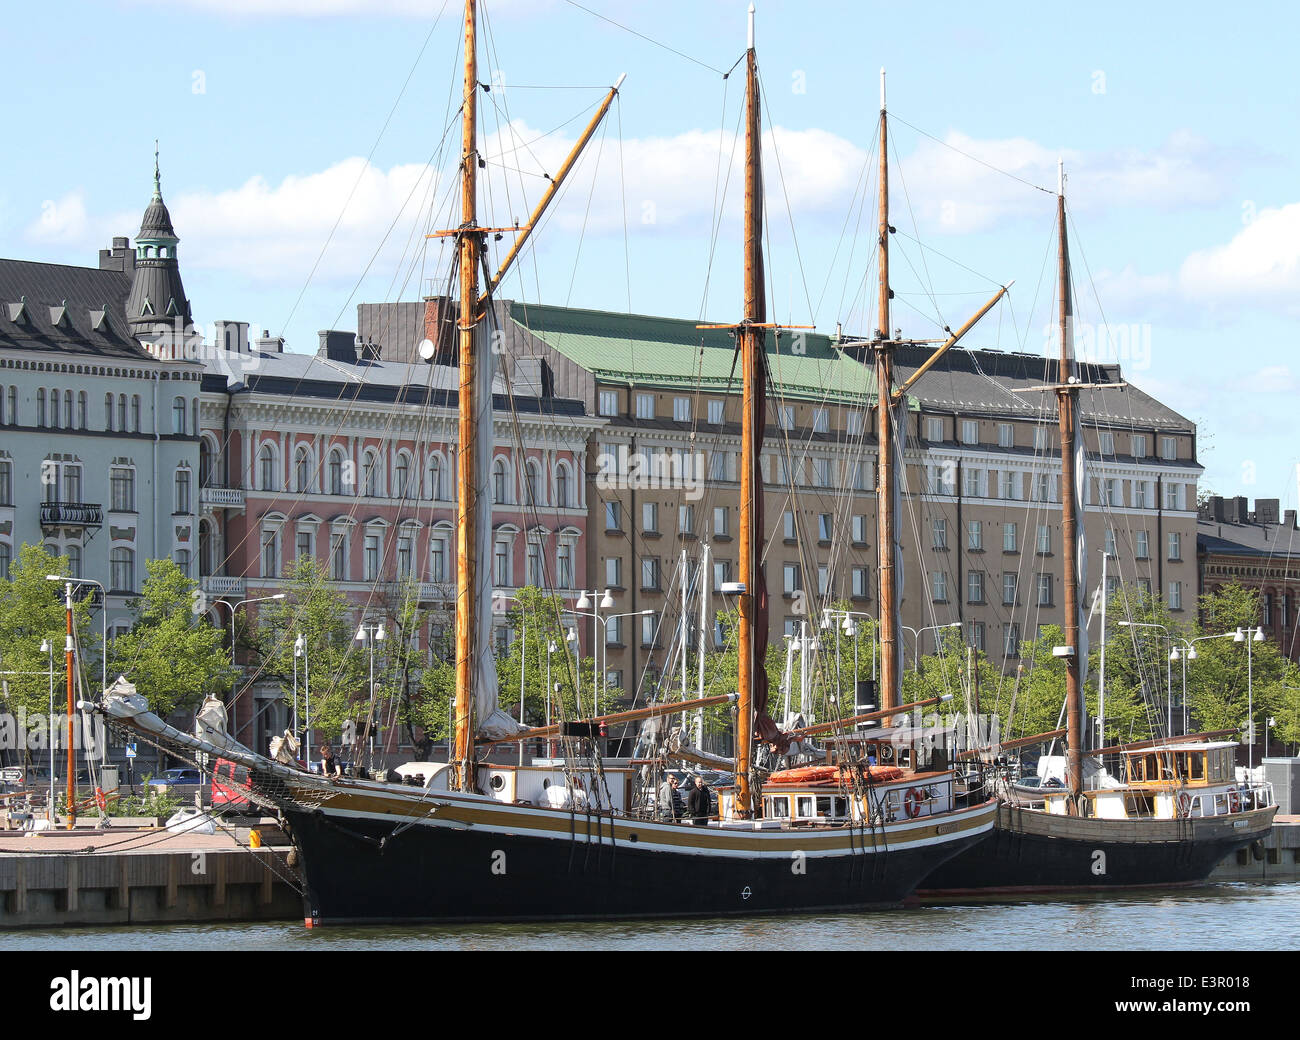 Sailing ships berthed alongside Pohjoisranta at the North Harbour Helsinki Finland - Stock Image